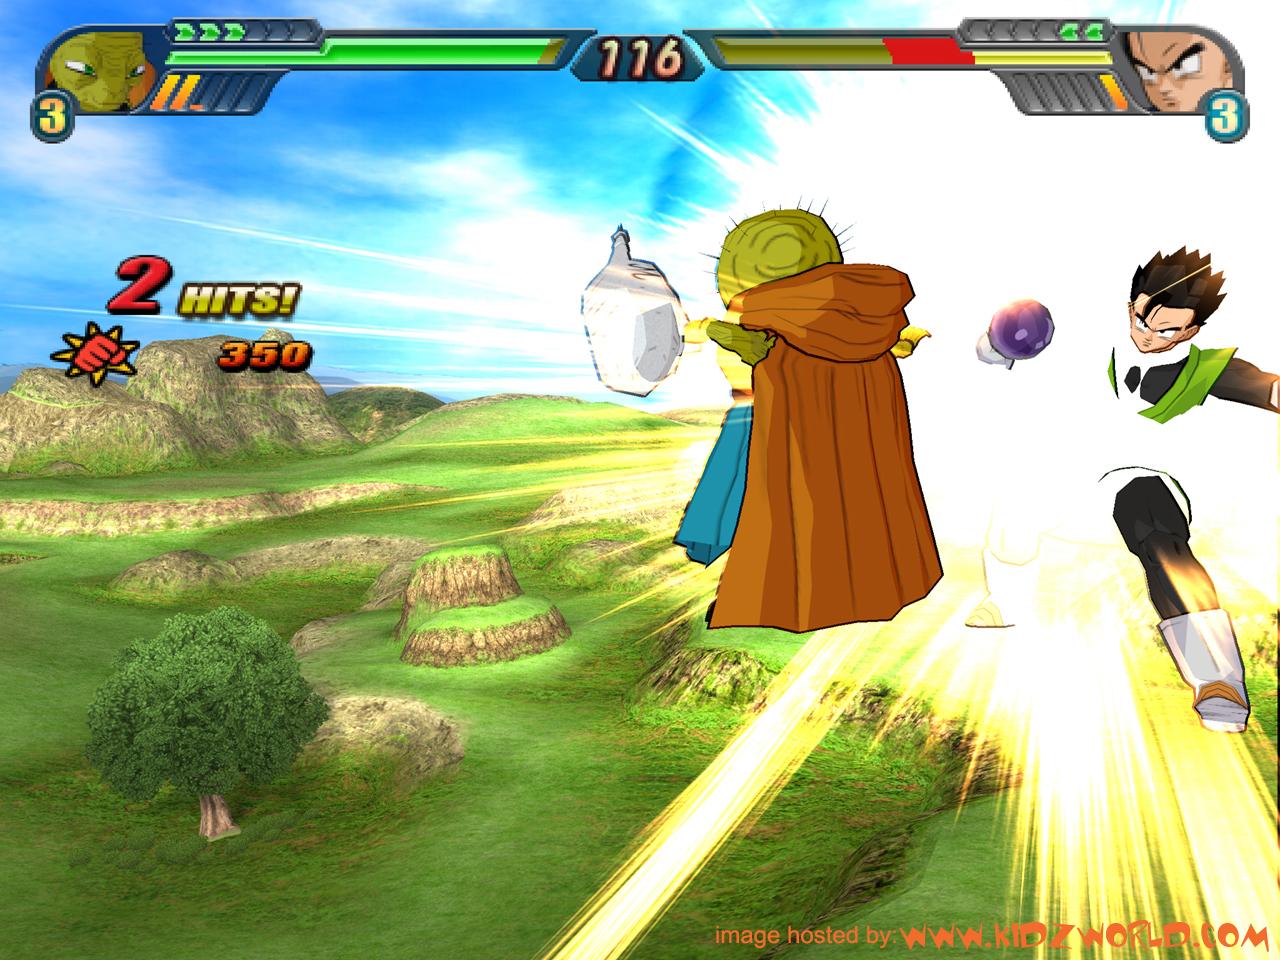 Dragon Ball Z Budokai Tenkaichi 3 Transformers The Game Video Trailer Pokemon Battle